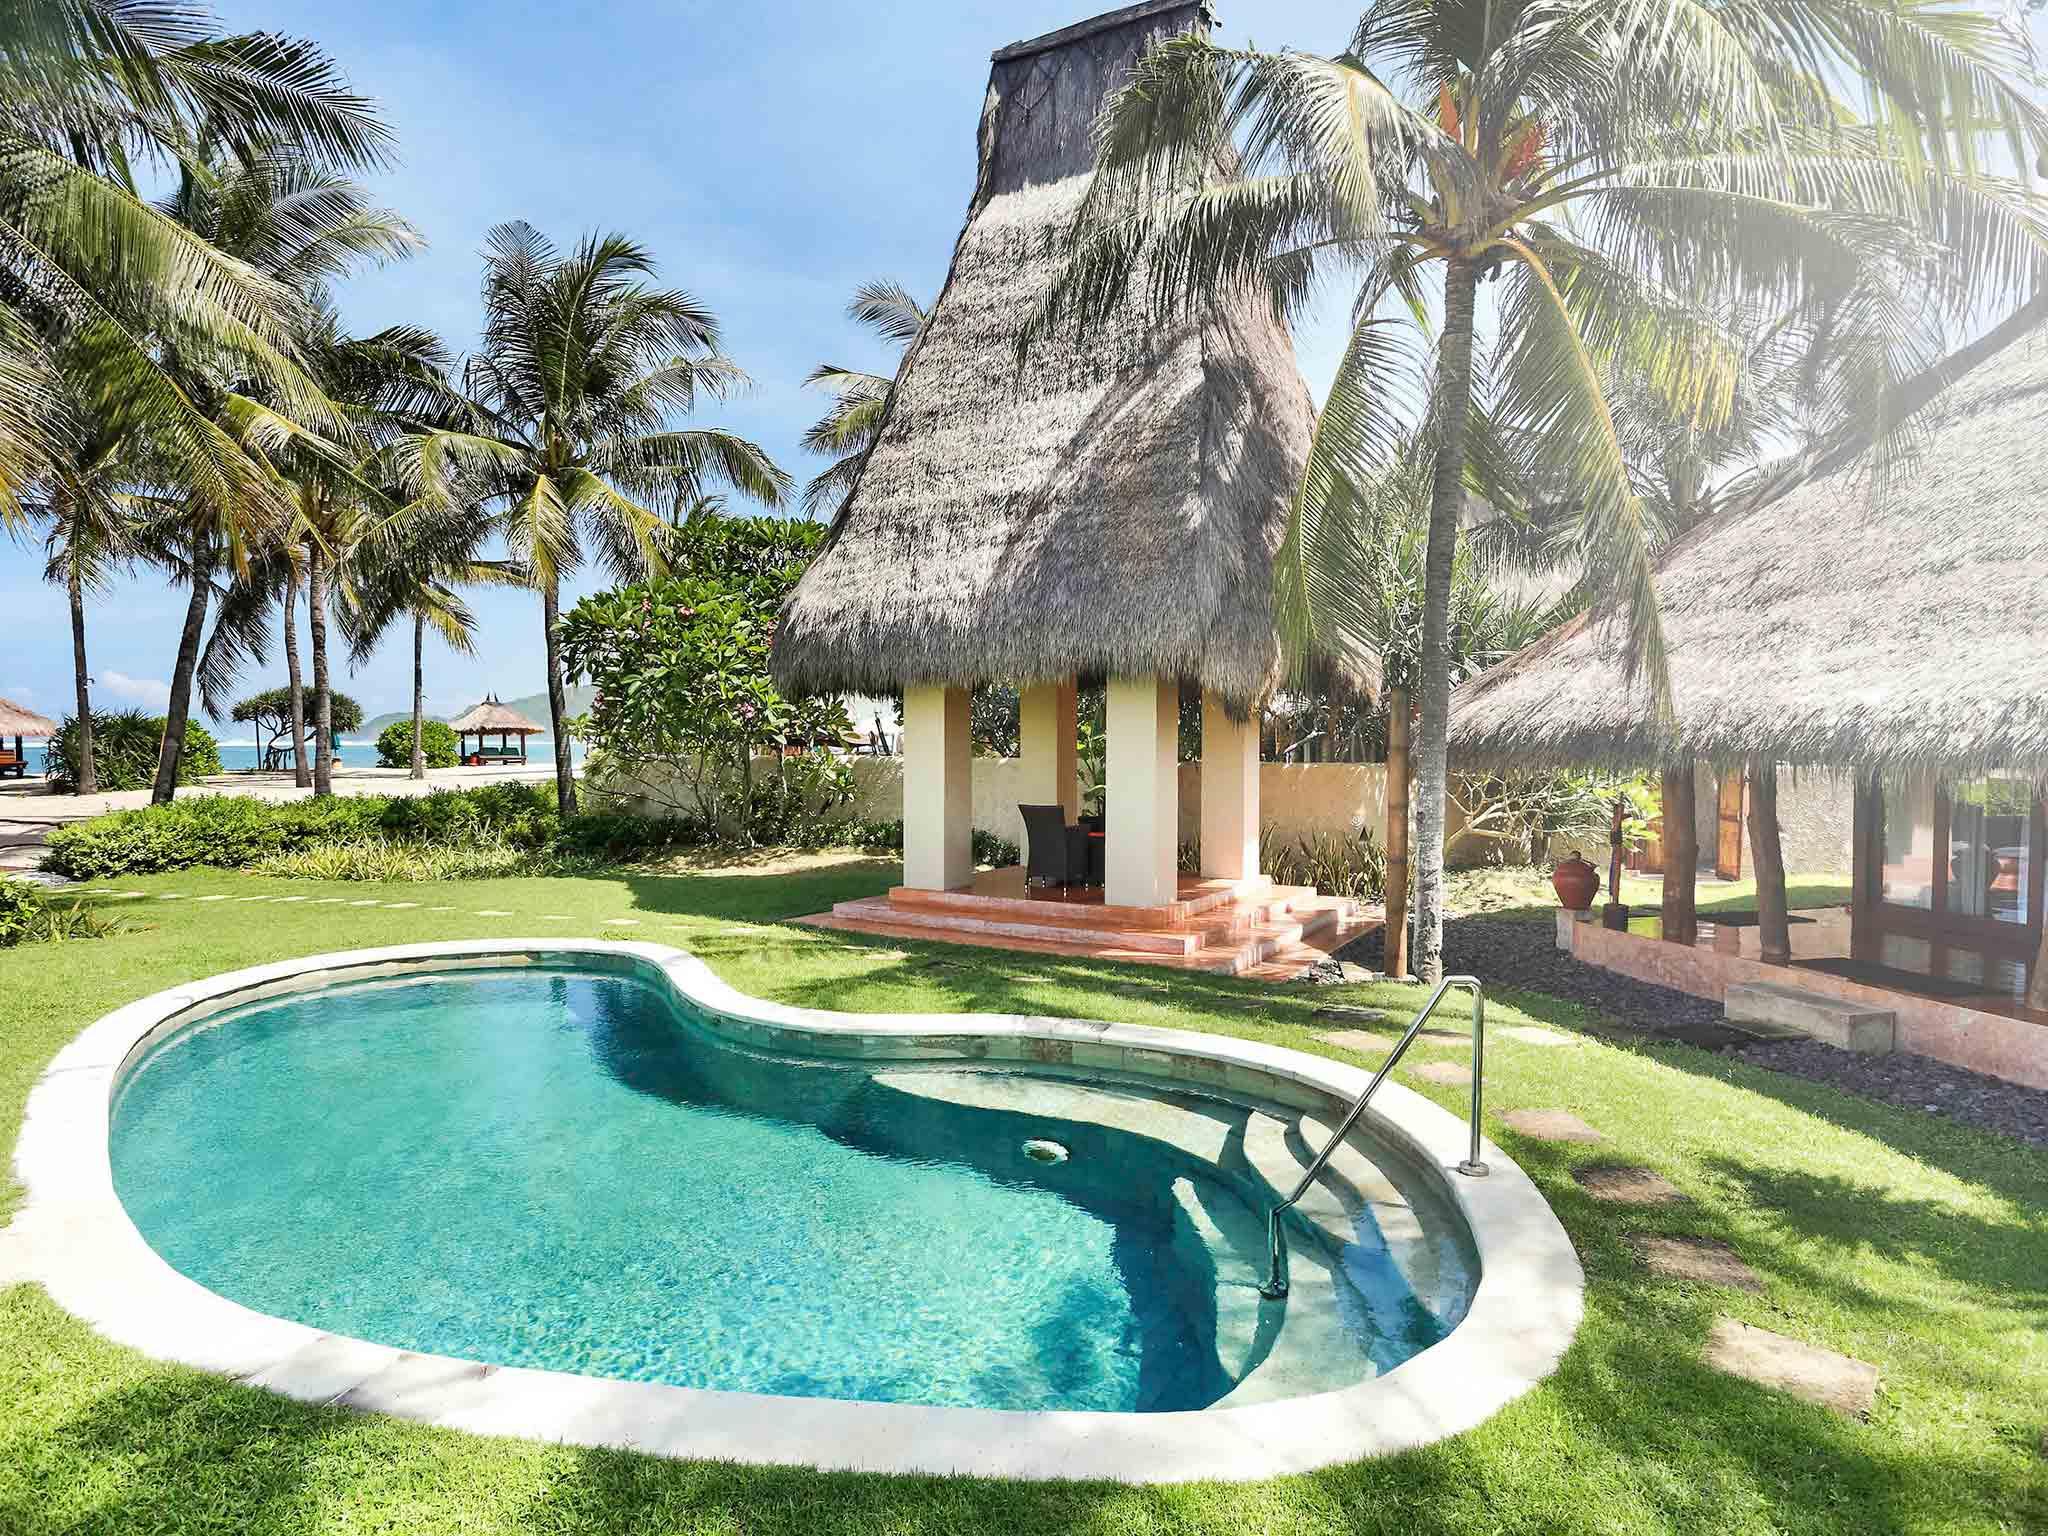 novotel lombok resort and villas luxury hotel accorhotels rh accorhotels com hotel di kuta lombok tengah nama hotel di lombok tengah